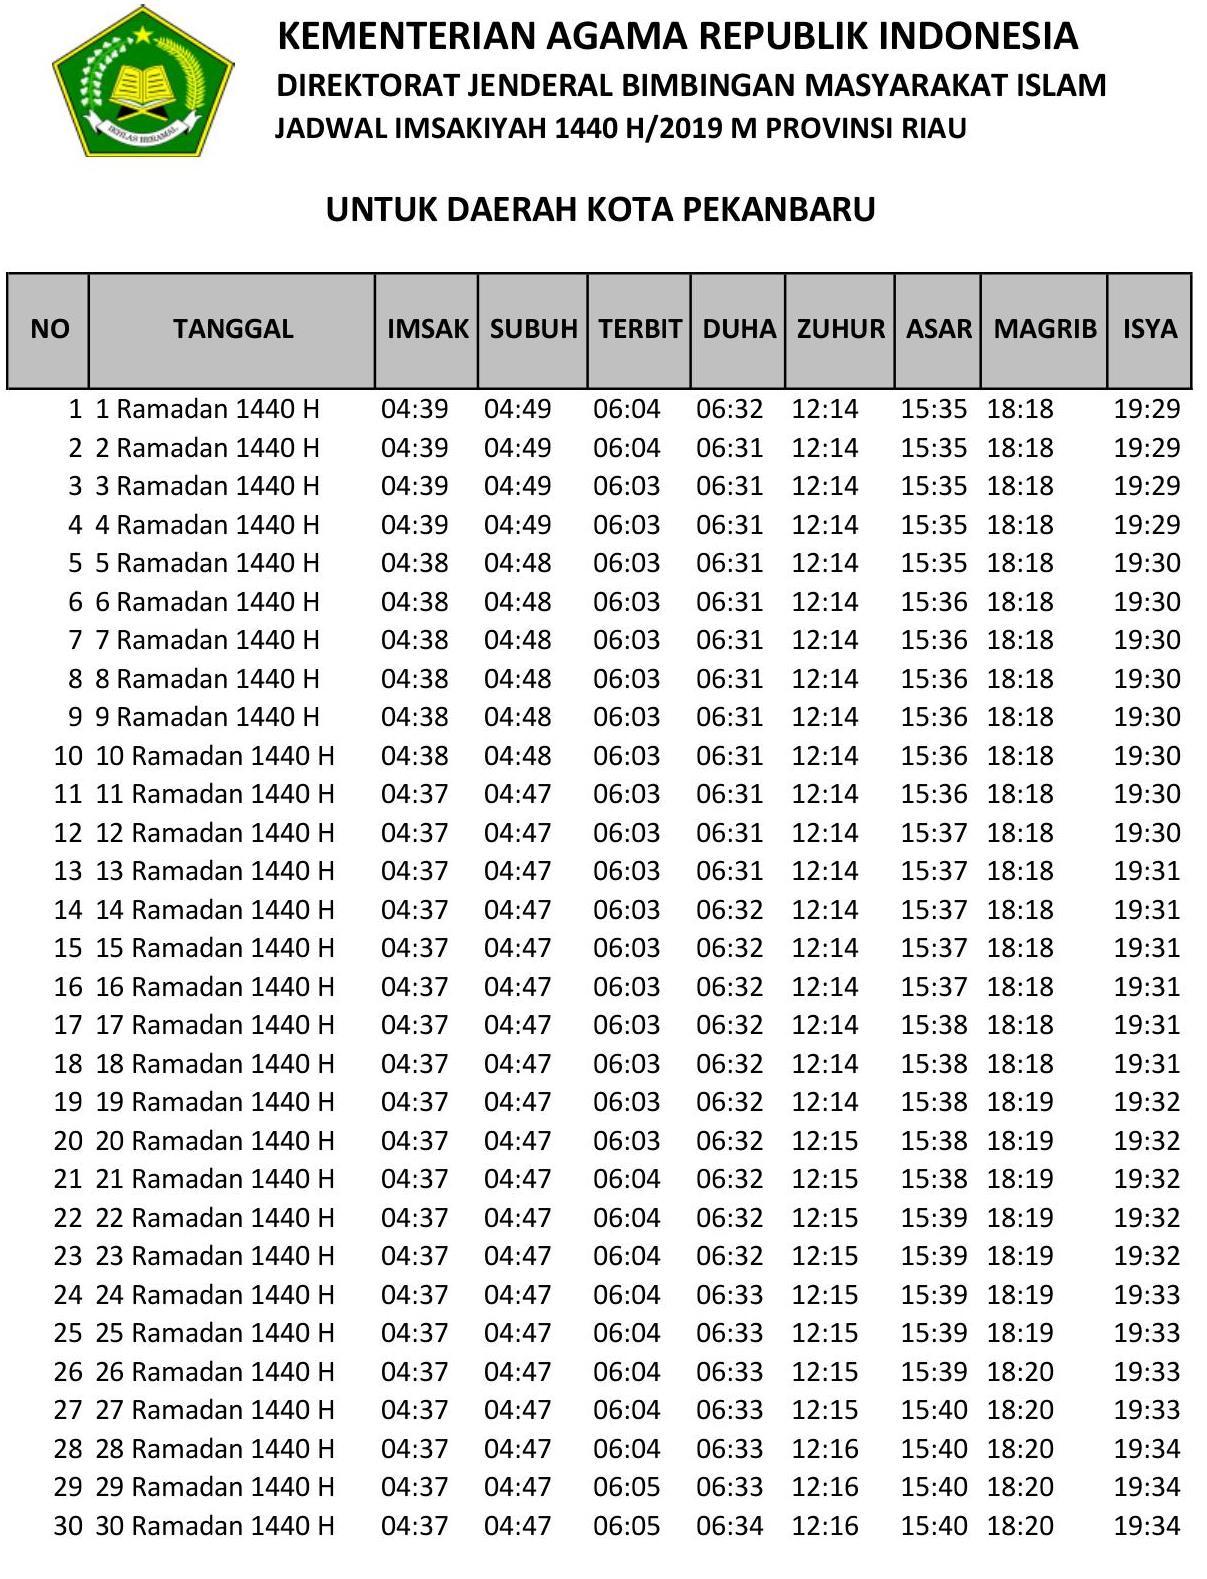 Jadwal Sholat dan Imsakiyah Pekan Baru-Ramadhan 2019-Waktu Maghrib, Waktu Imsak, dan Waktu Shubuh di Wilayah Kota Pekan Baru dan Sekitarnya-Bulan Puasa 2019-1440 Hijriyah.